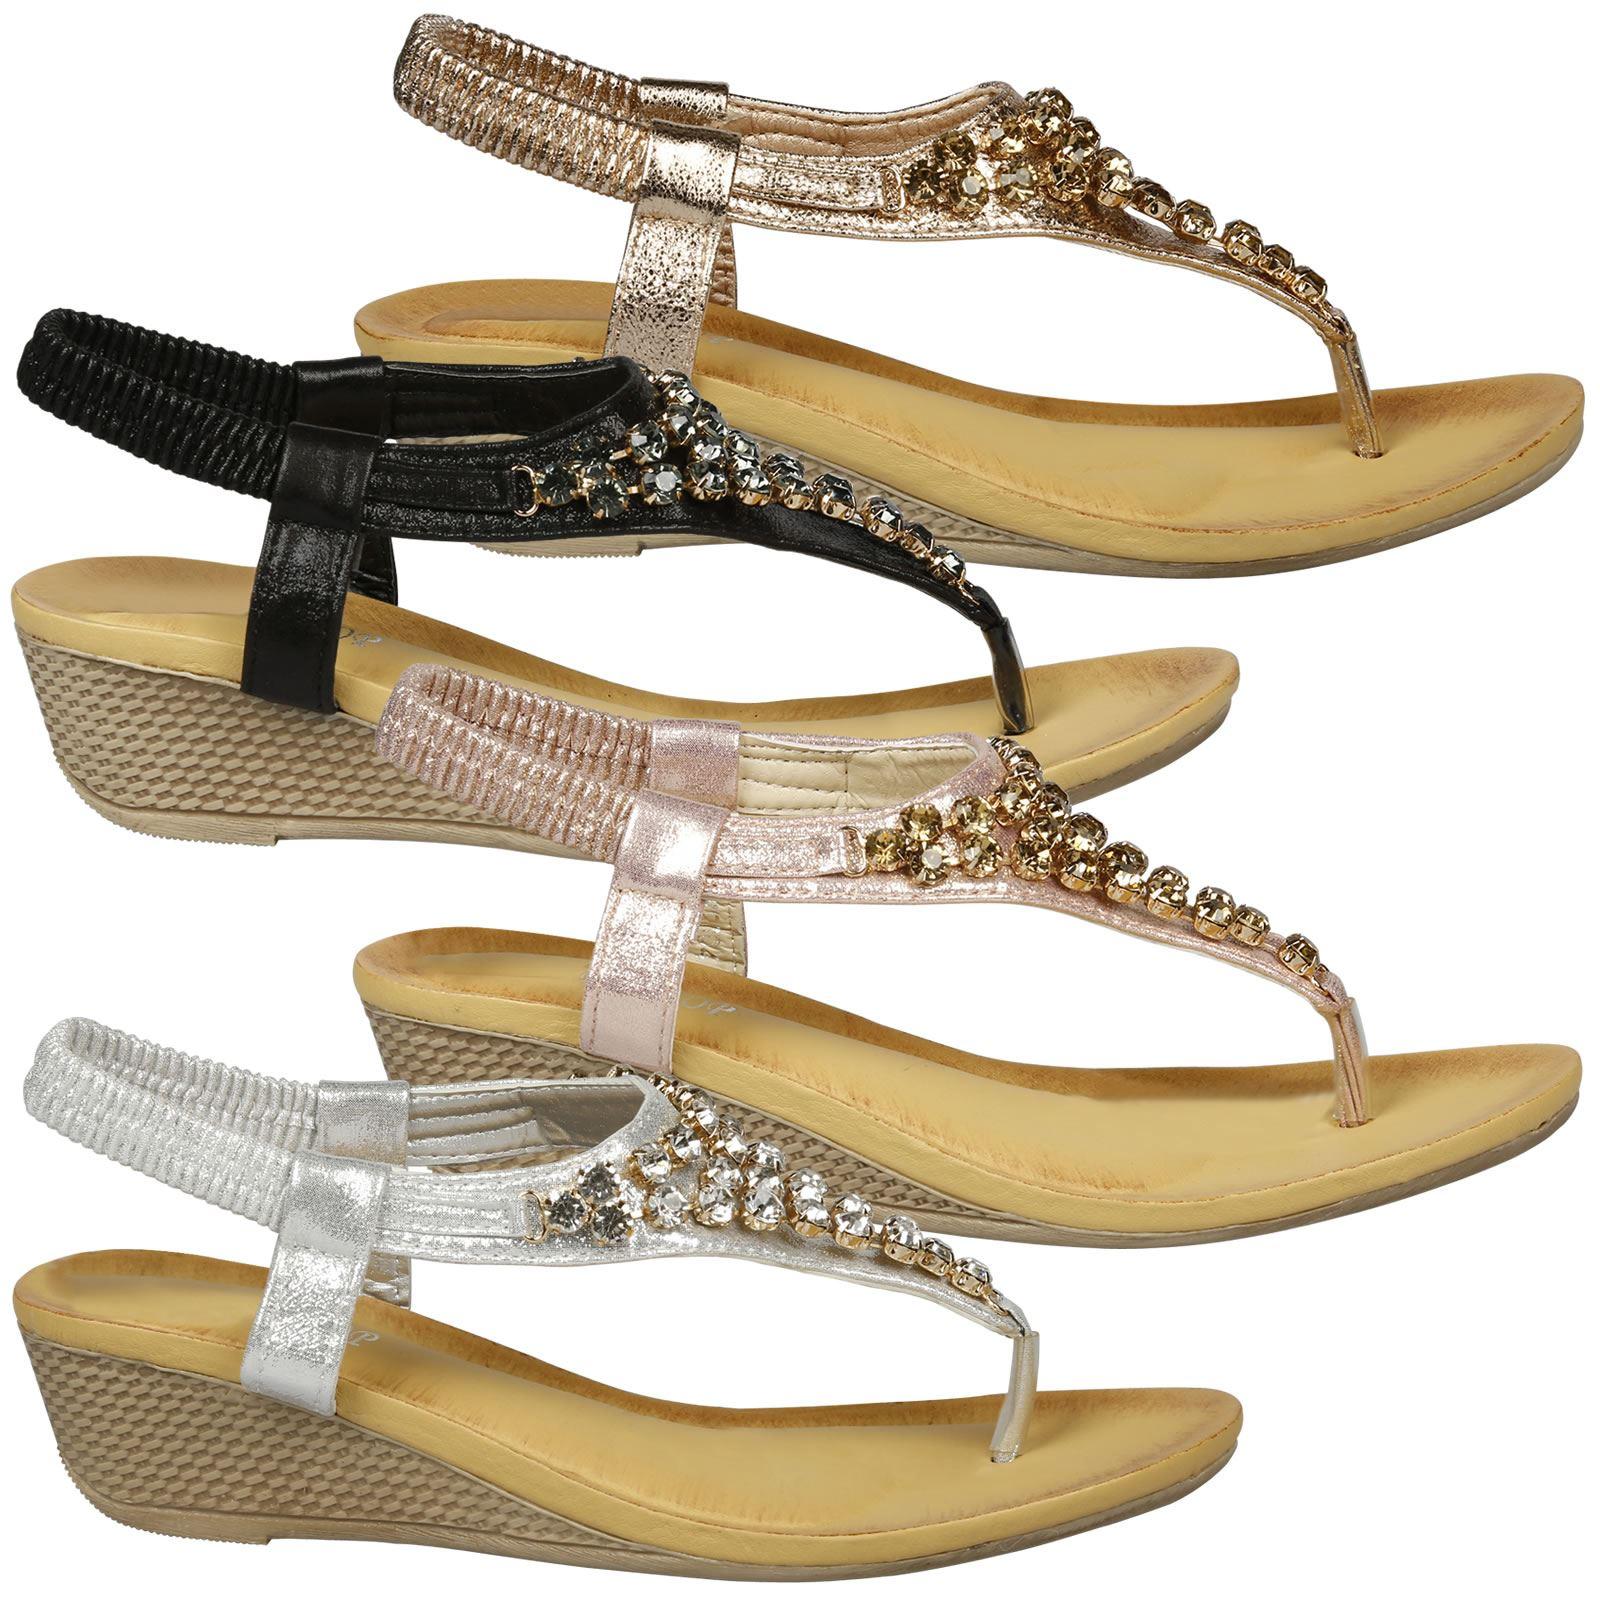 437d11193a5 Details about Ceres Womens Low Wedges Heels Toe Post Sandals Ladies  Diamante Shoes Summer Size